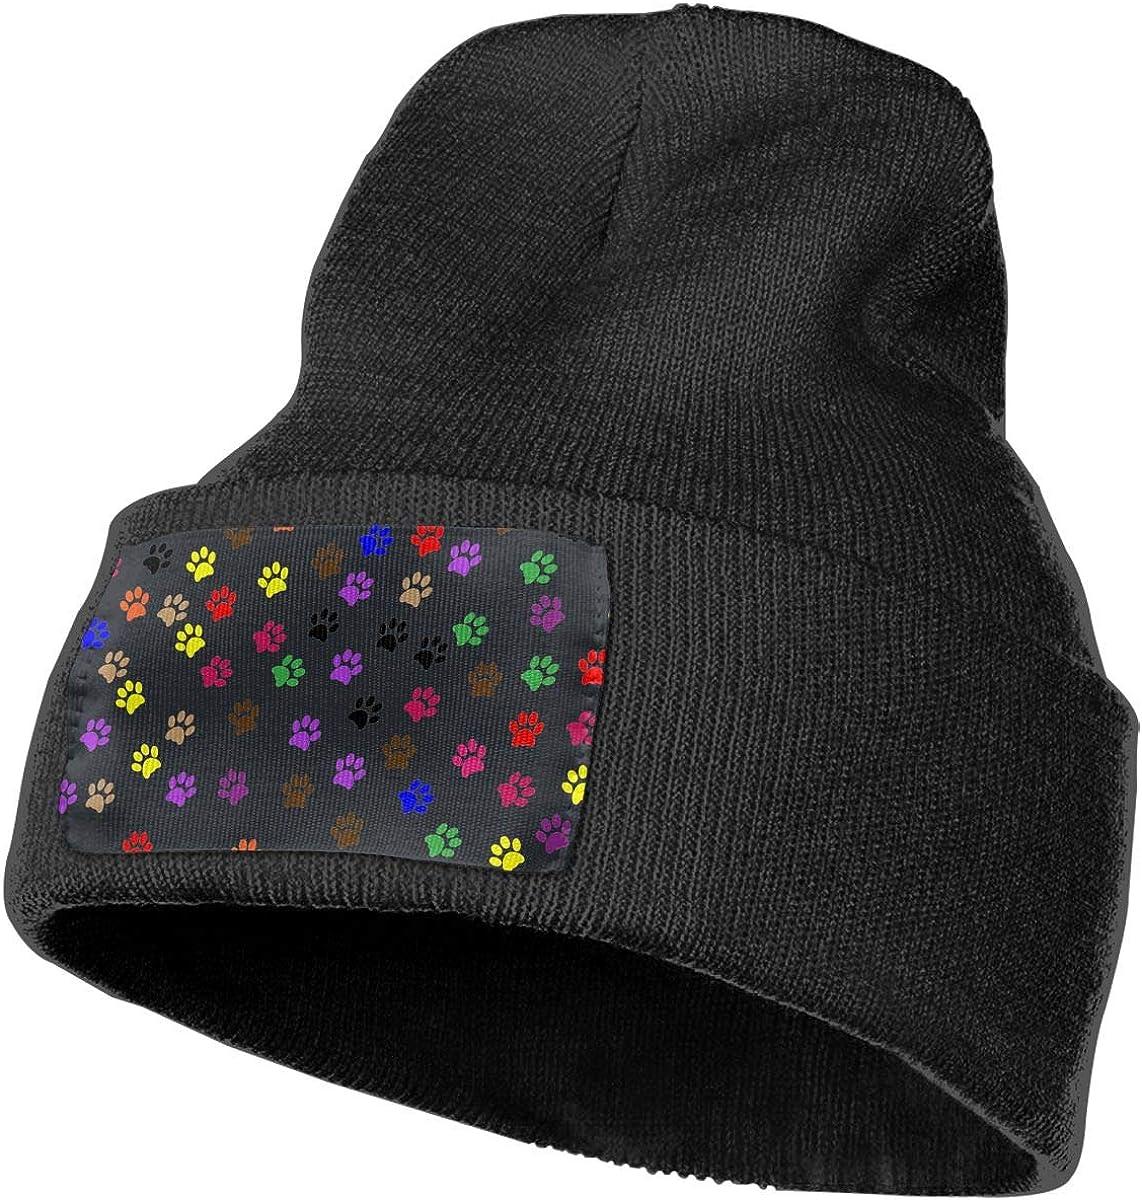 100/% Acrylic Acid Mas Beanie Hat Ruin Dog Paw Prints Fashion Knitting Hat for Men Women